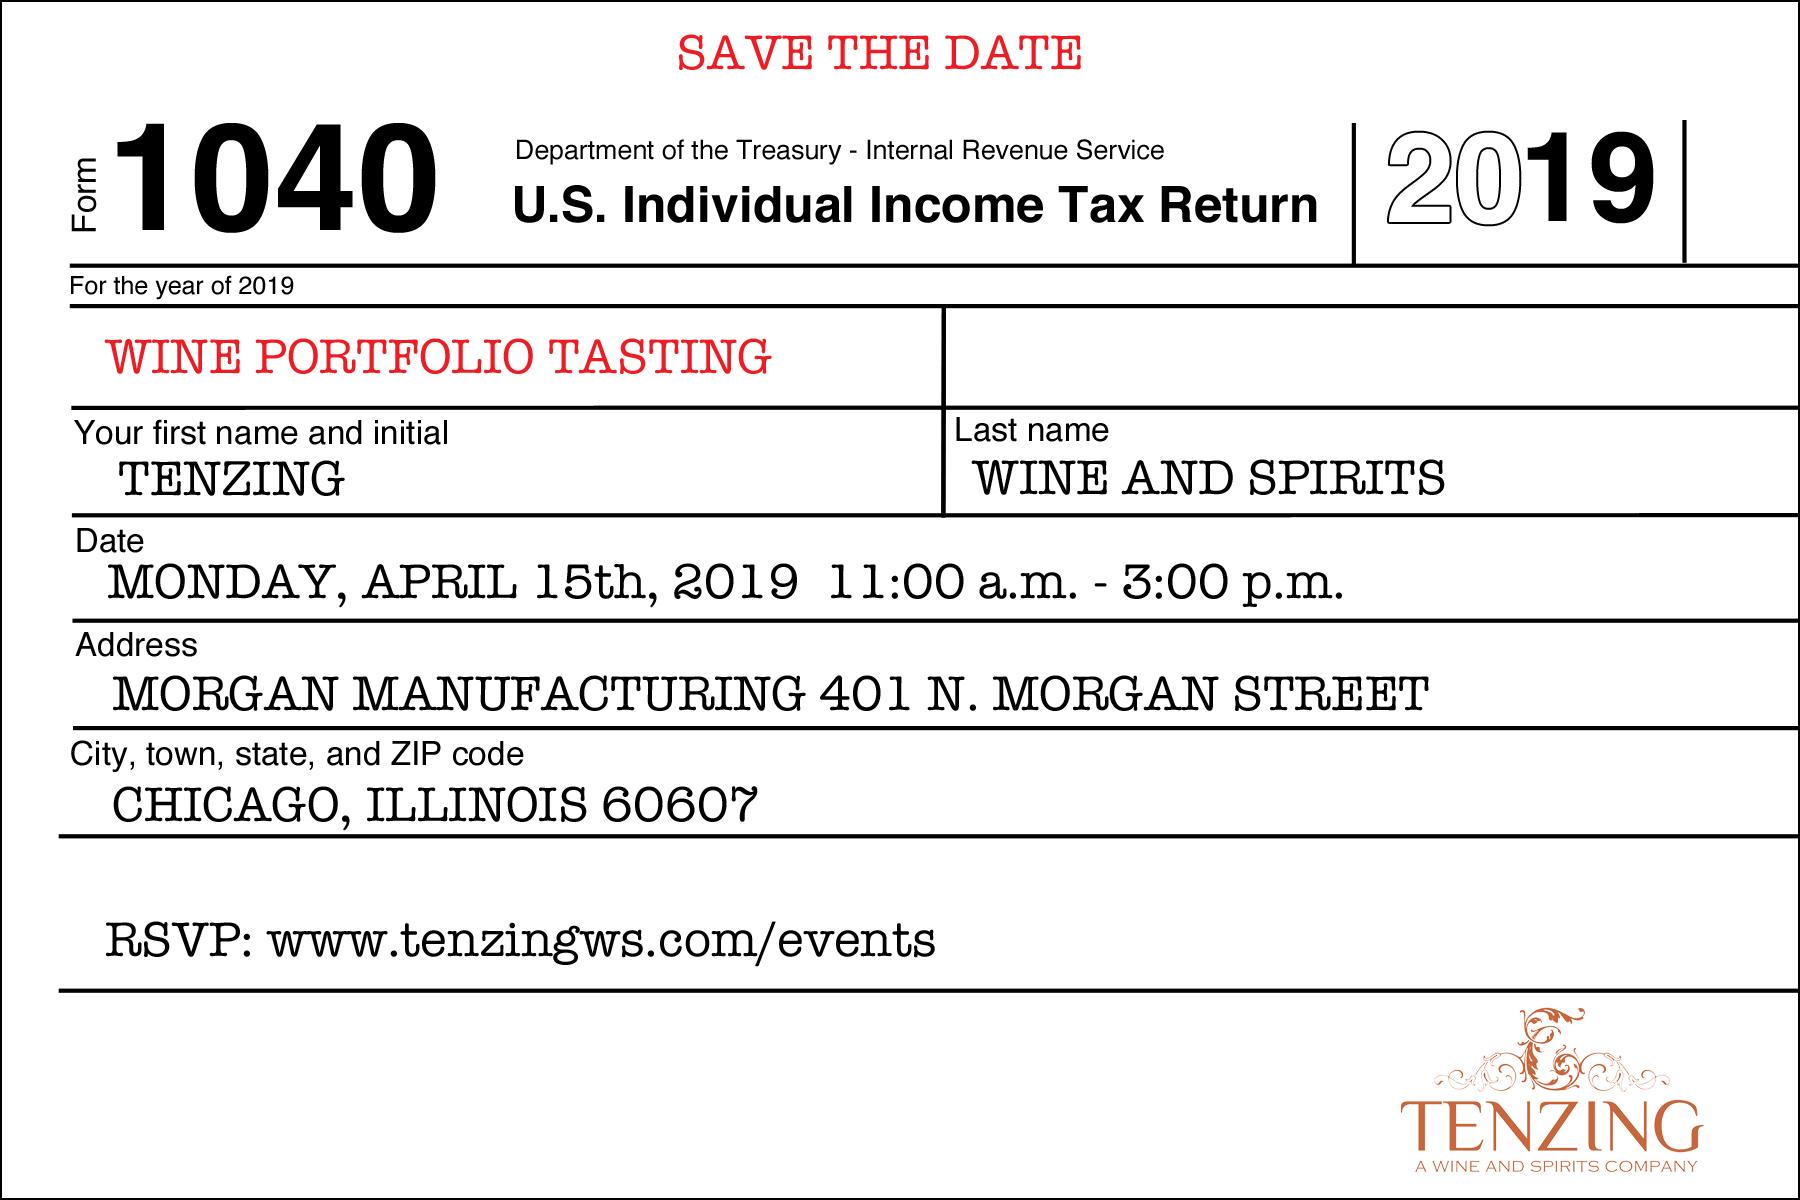 Tenzing-portfolio-invite-2019.jpg